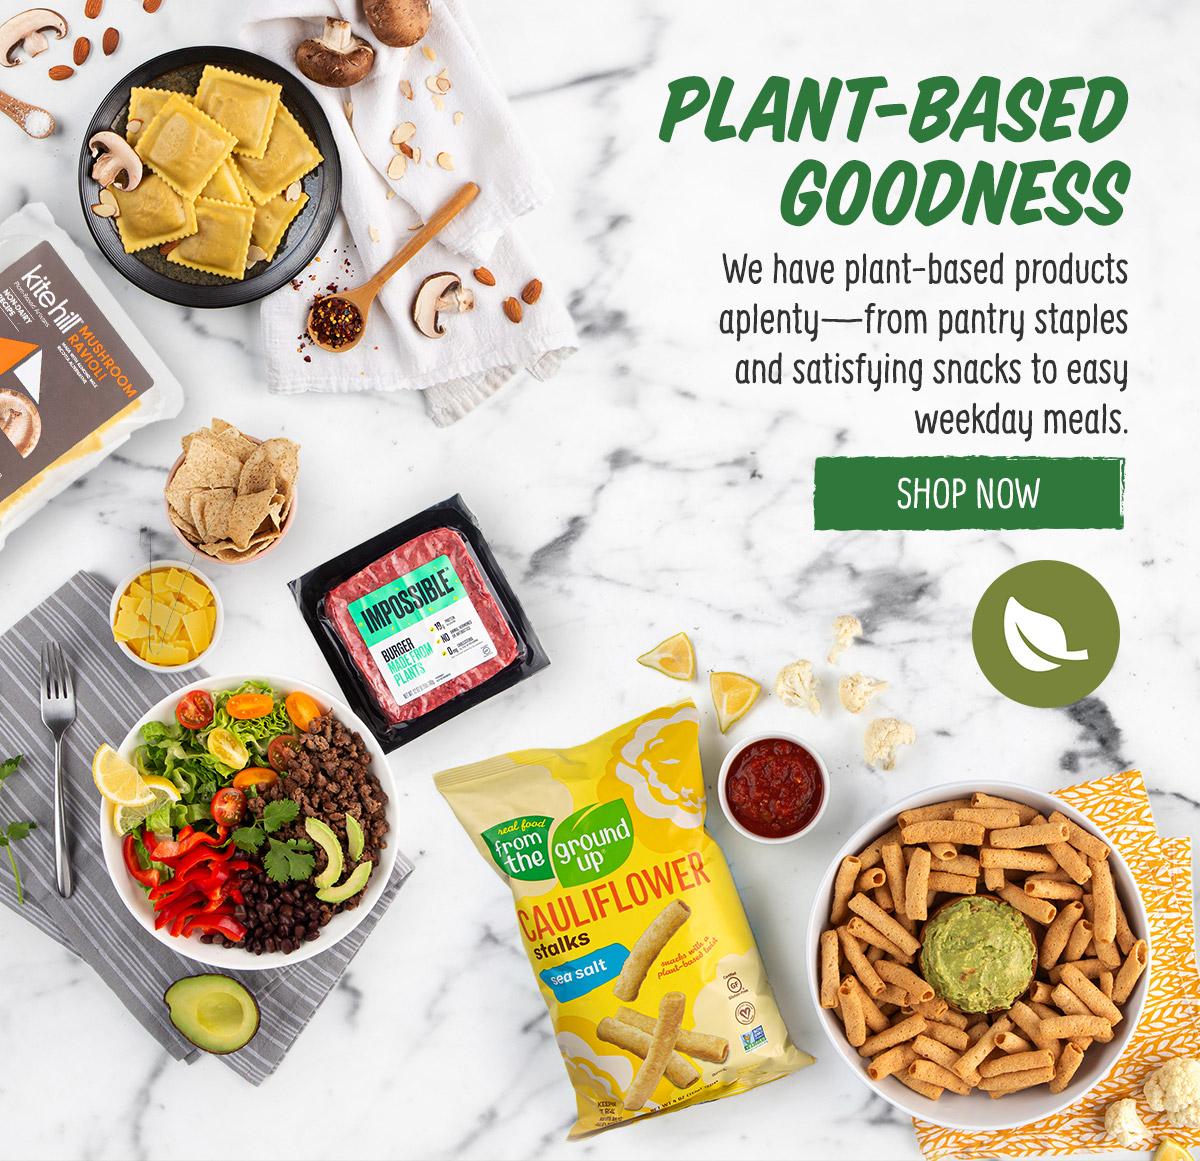 Plant-Based Goodness